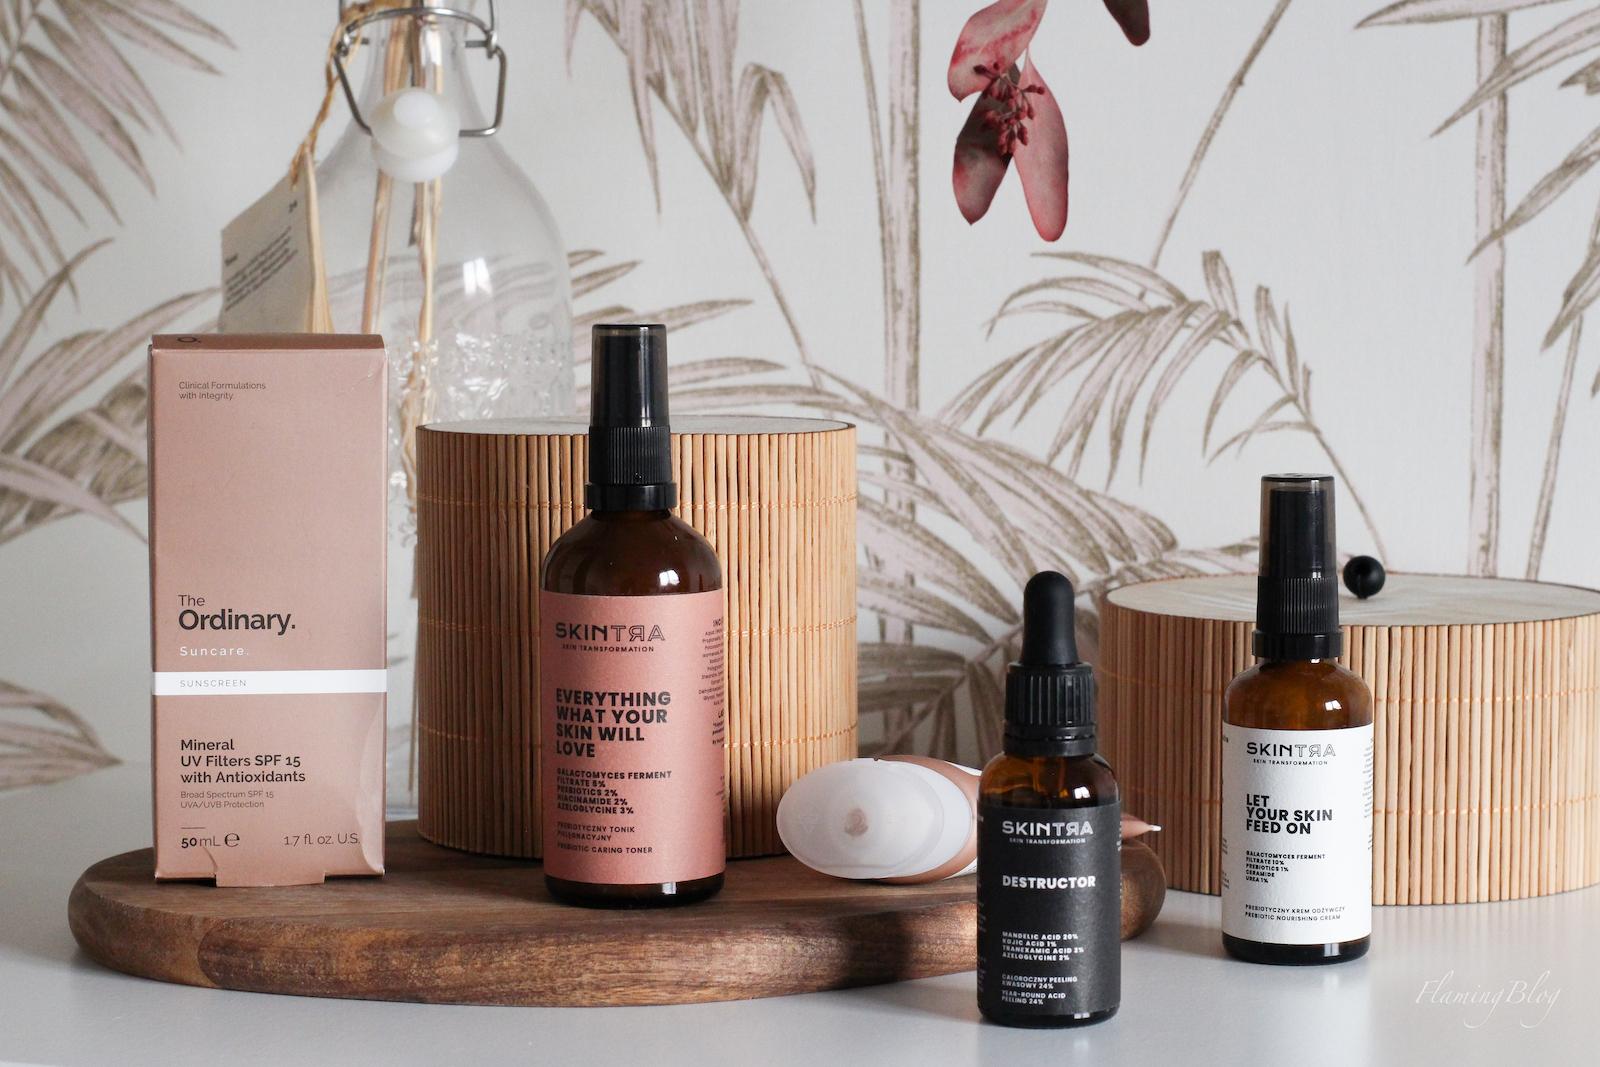 kosmetyki SkinTra i The Ordinary